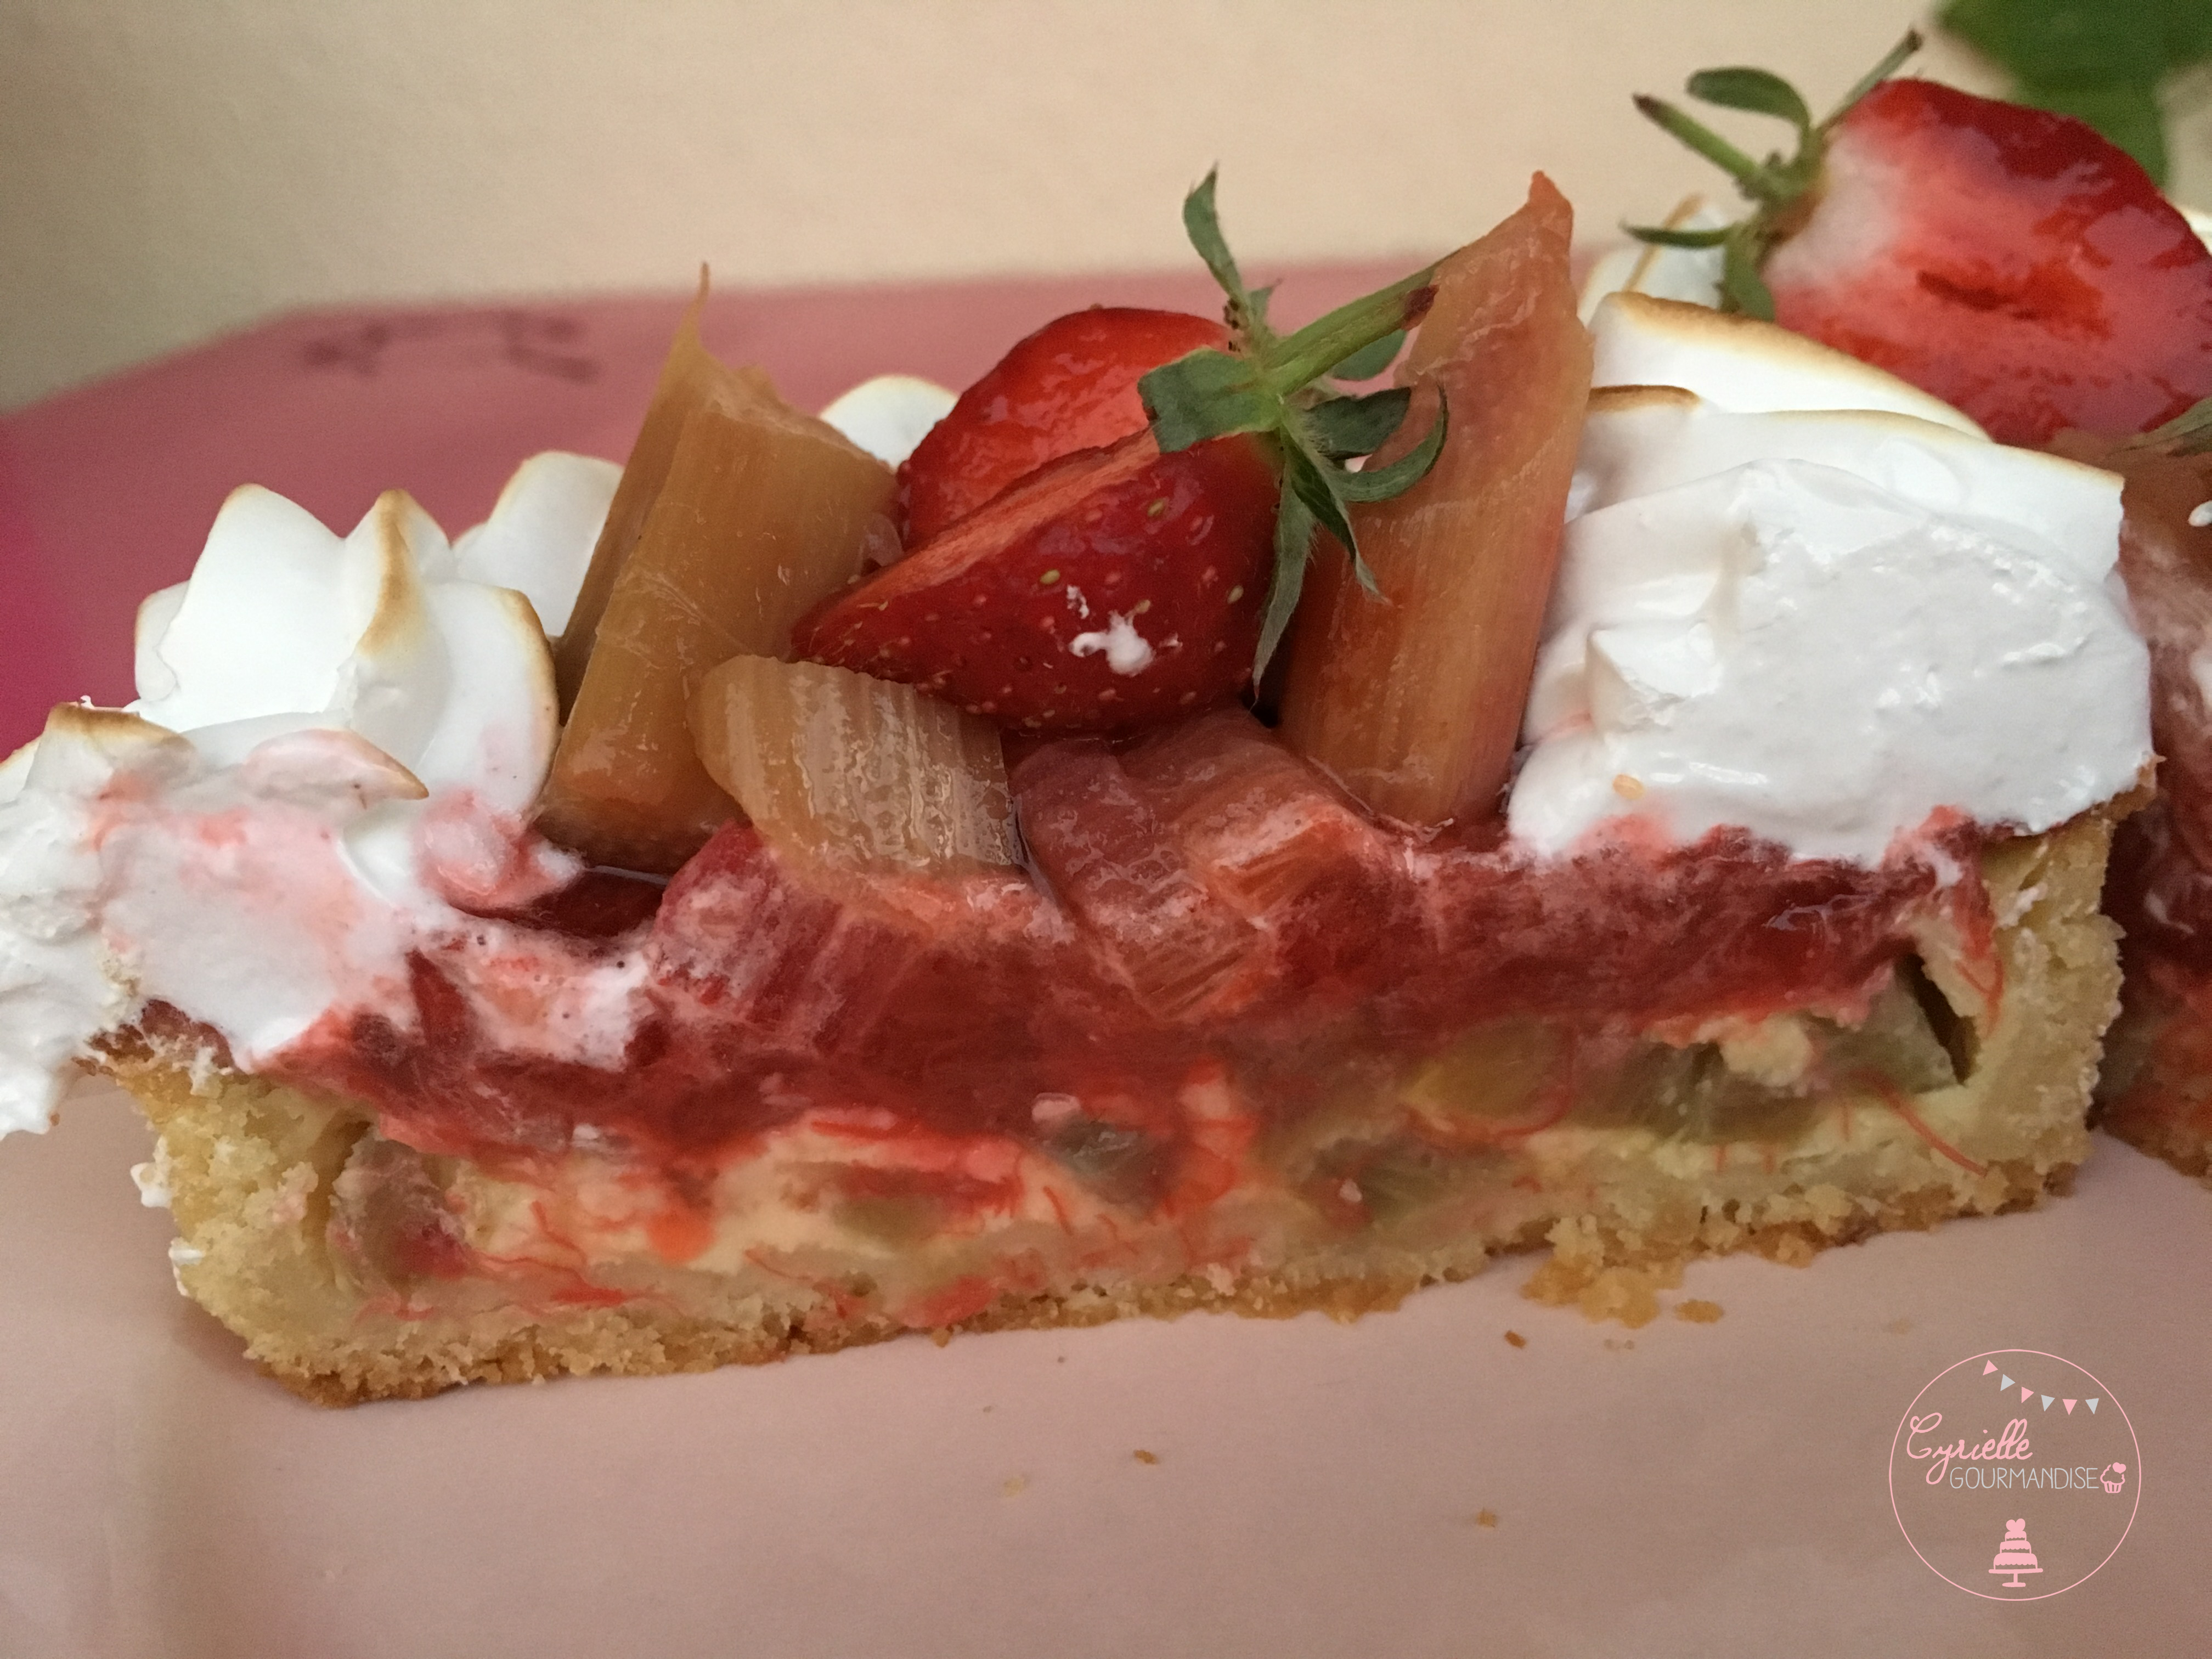 Tarte rhubarbe fraise meringuée intérieur